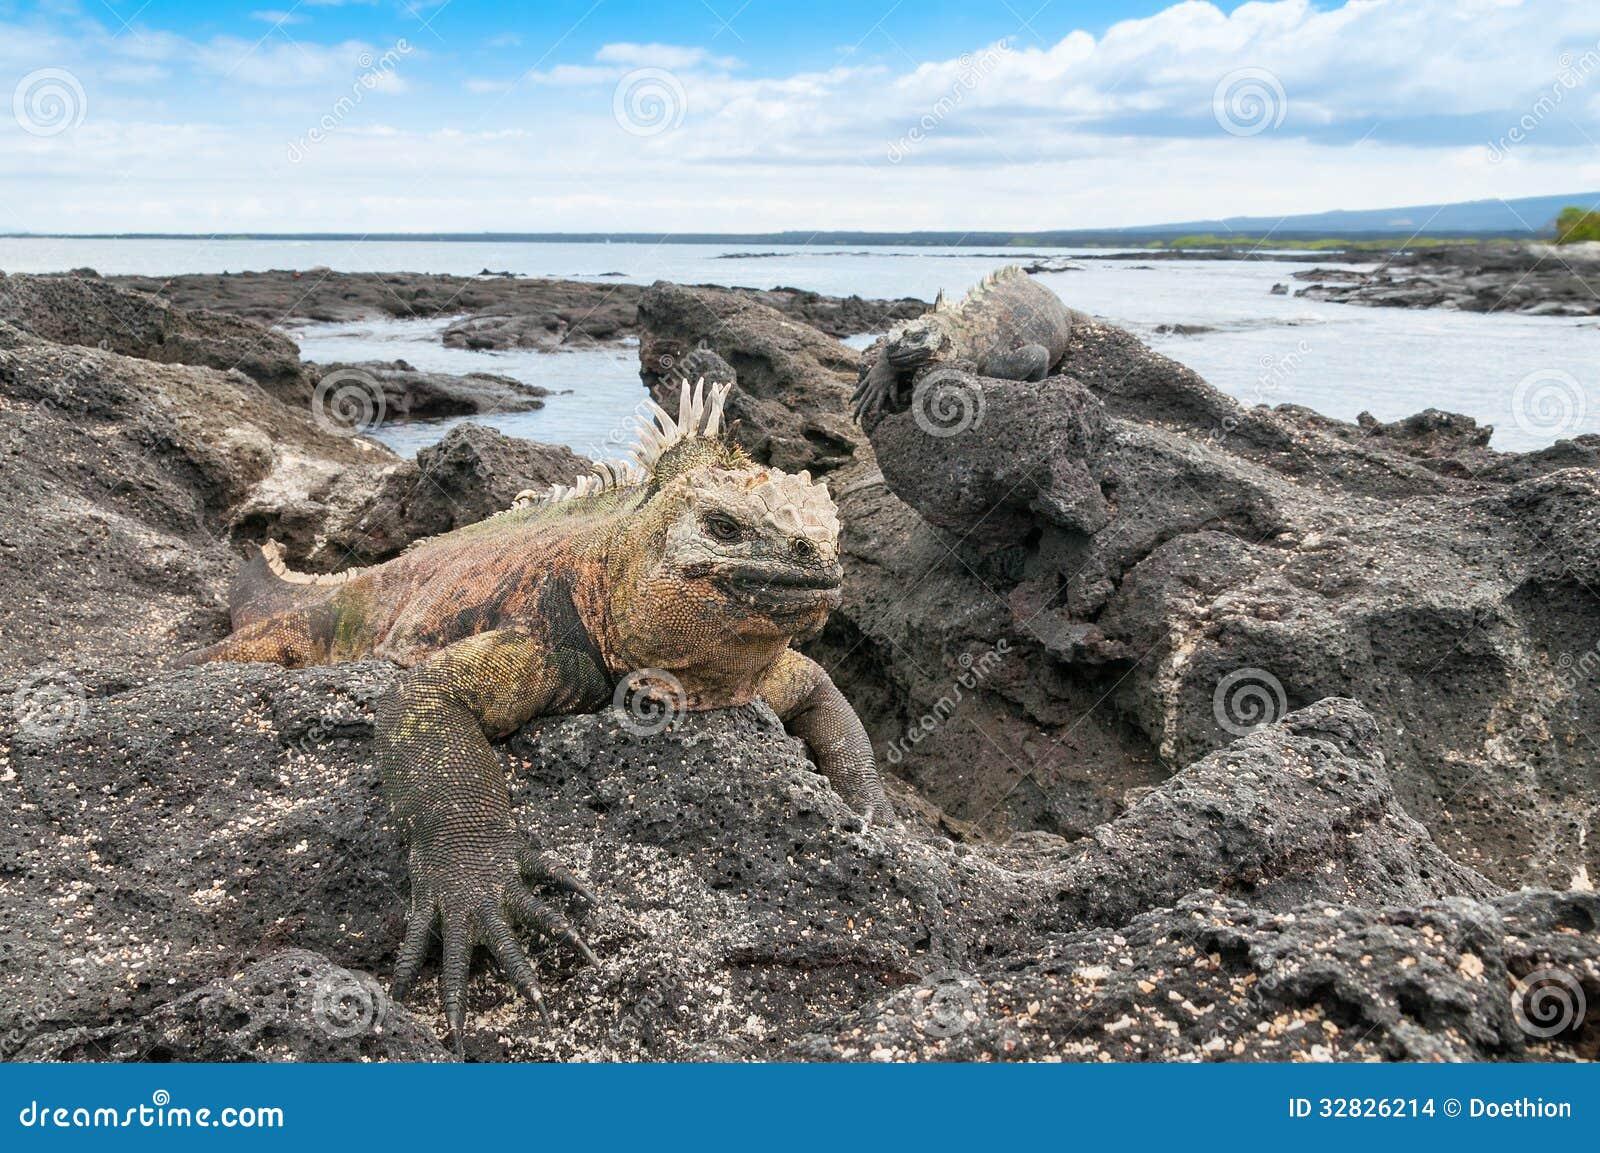 Galapagos marine iguana on a rocky outcrop